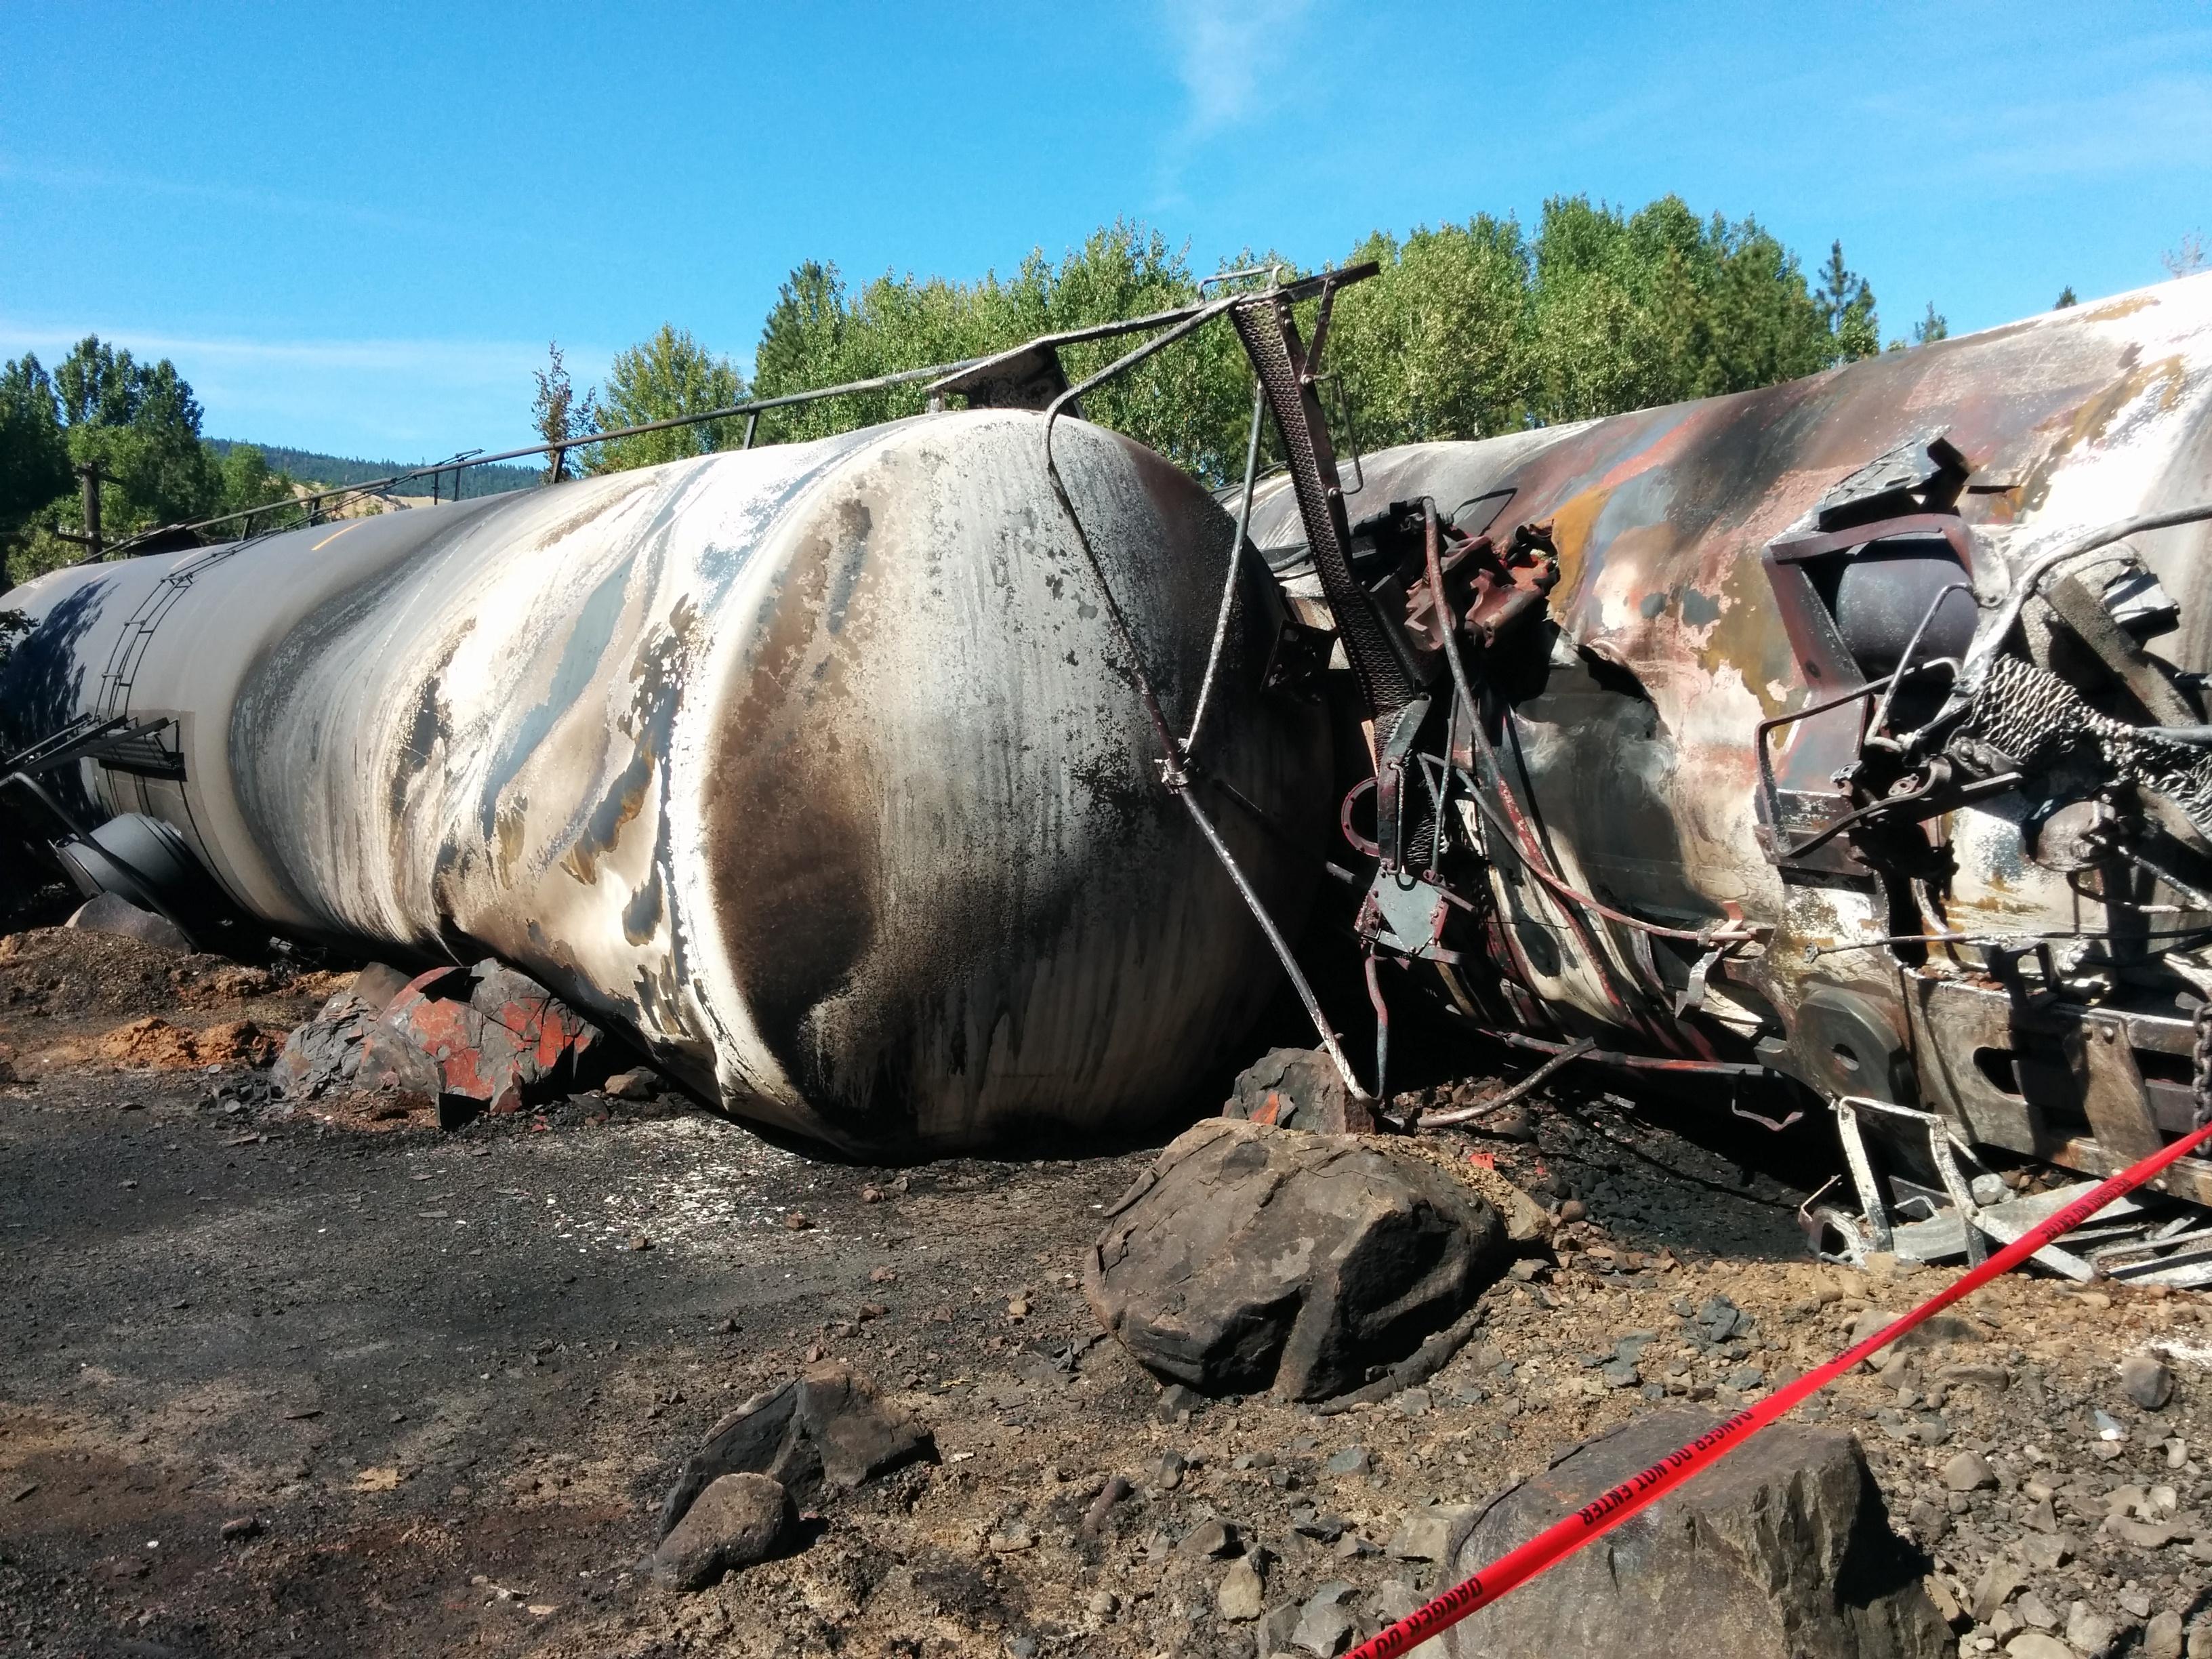 A photo provided by Oregon DEQ shows debris following a train derailment in Oregon.